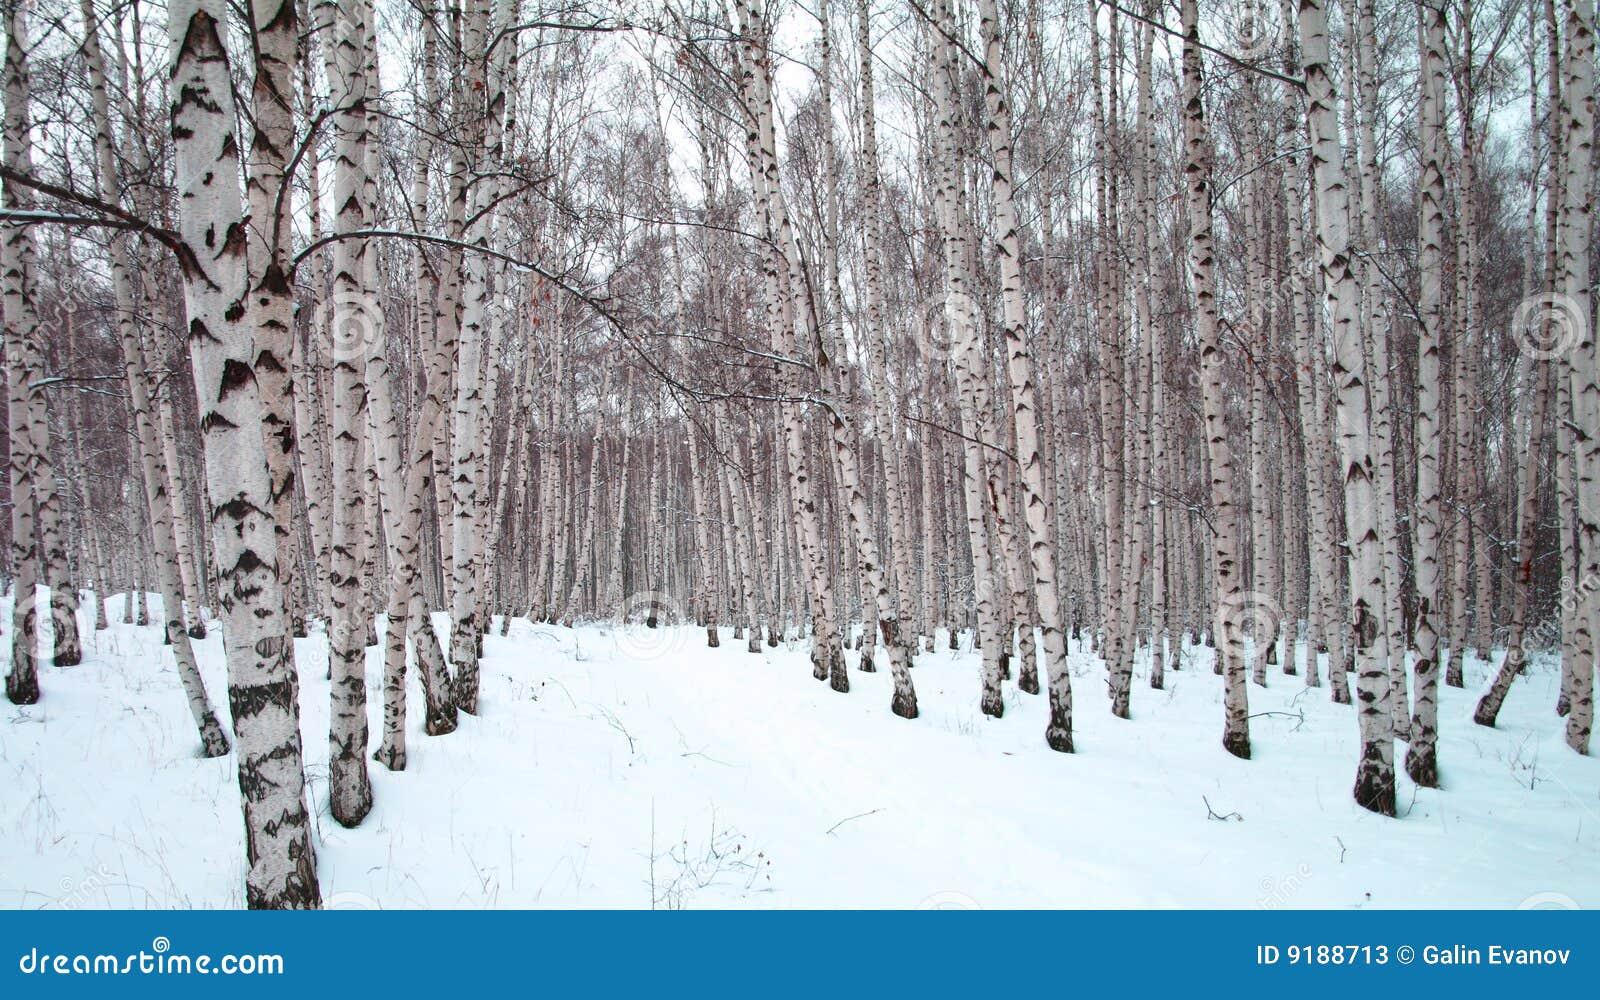 Birch trees in winter clip art a winter birch tree forest